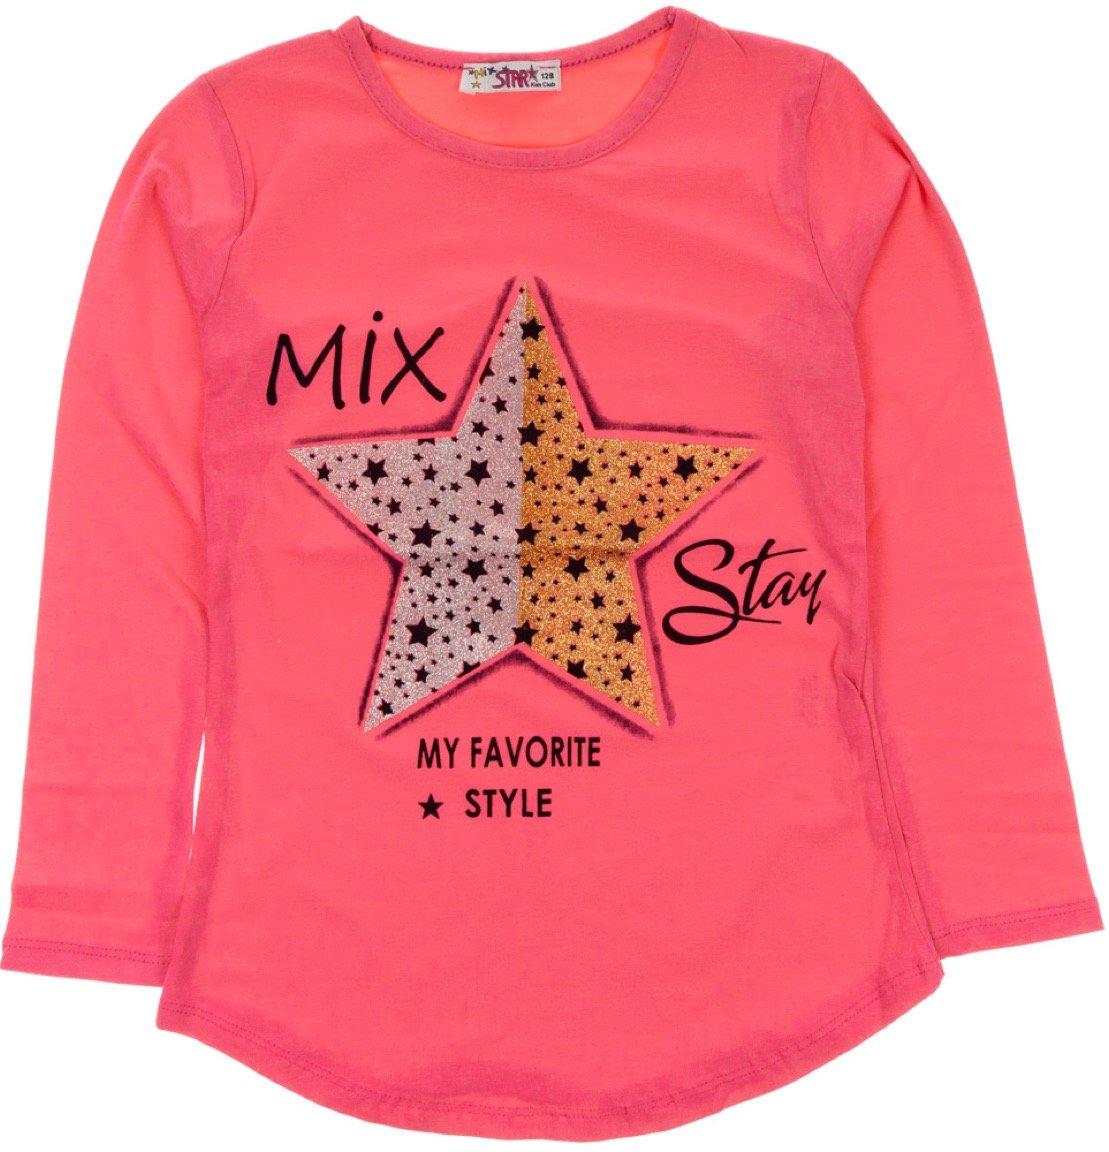 Mix Star παιδική εποχιακή μπλούζα «Favorite Style»